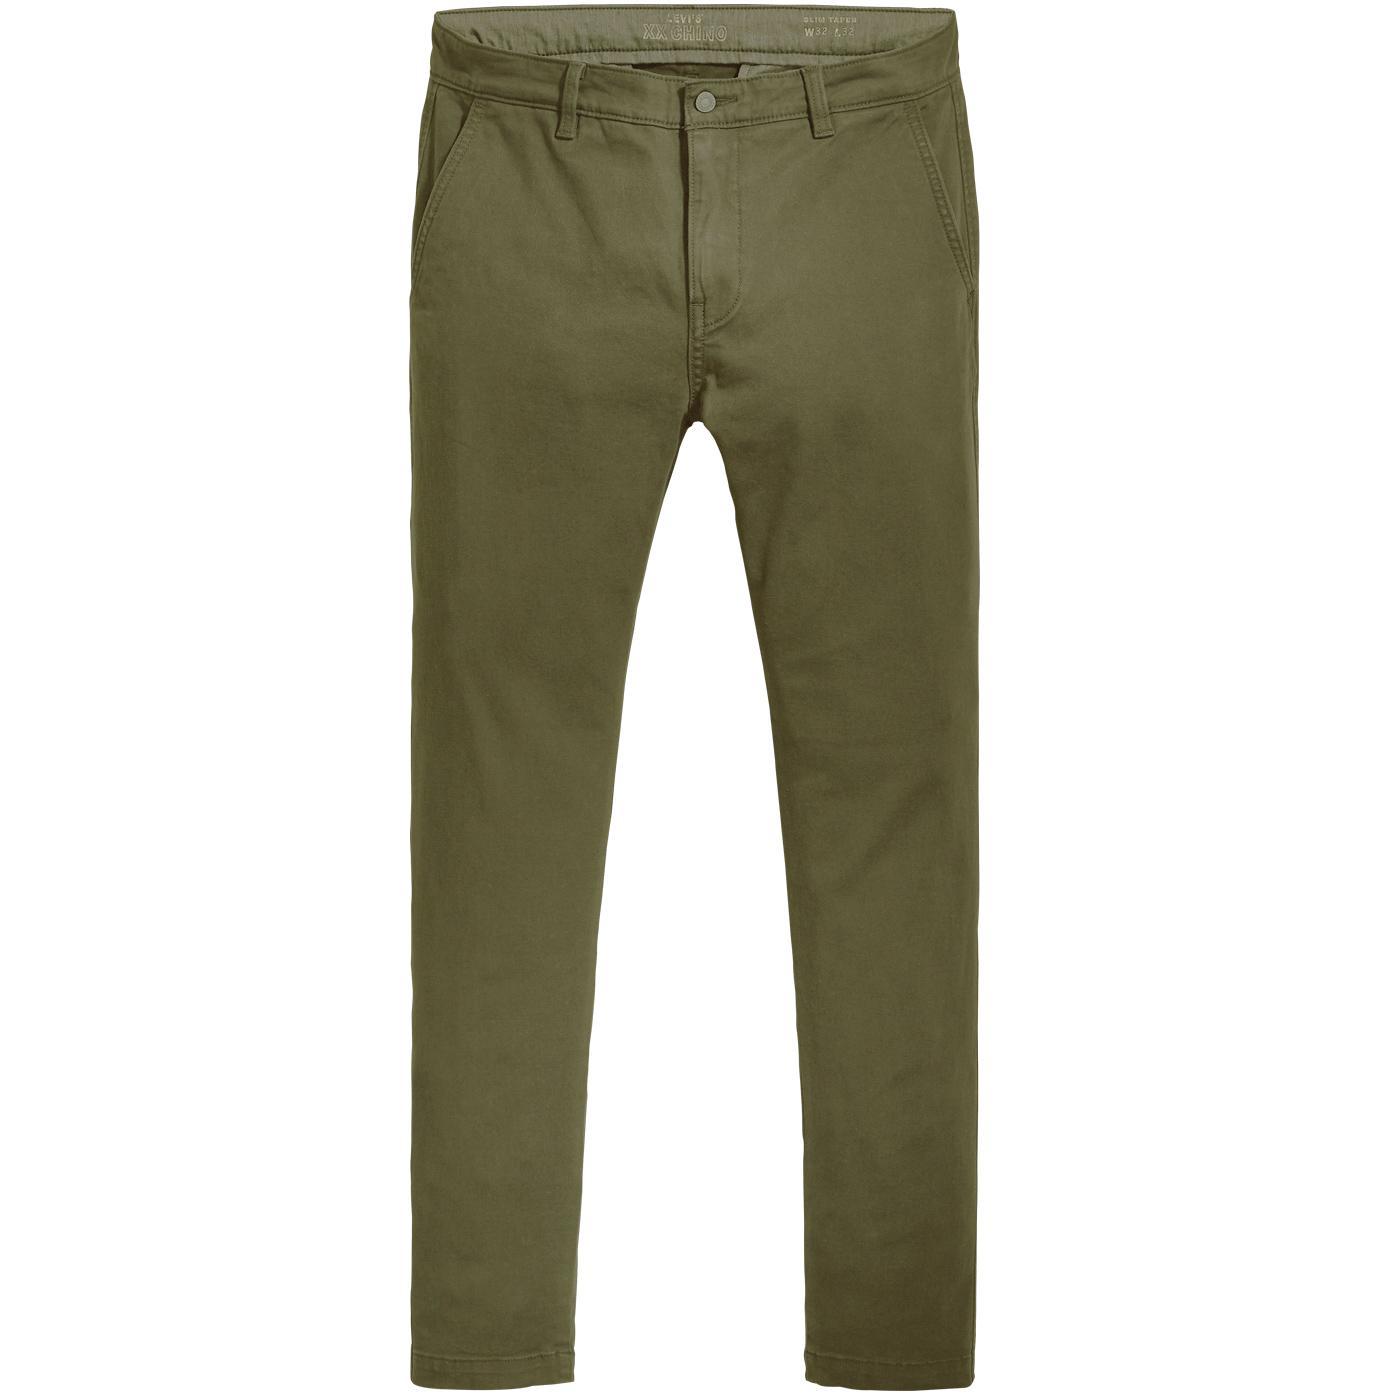 LEVI'S Slim Taper XX Chino II Trousers (Olive)